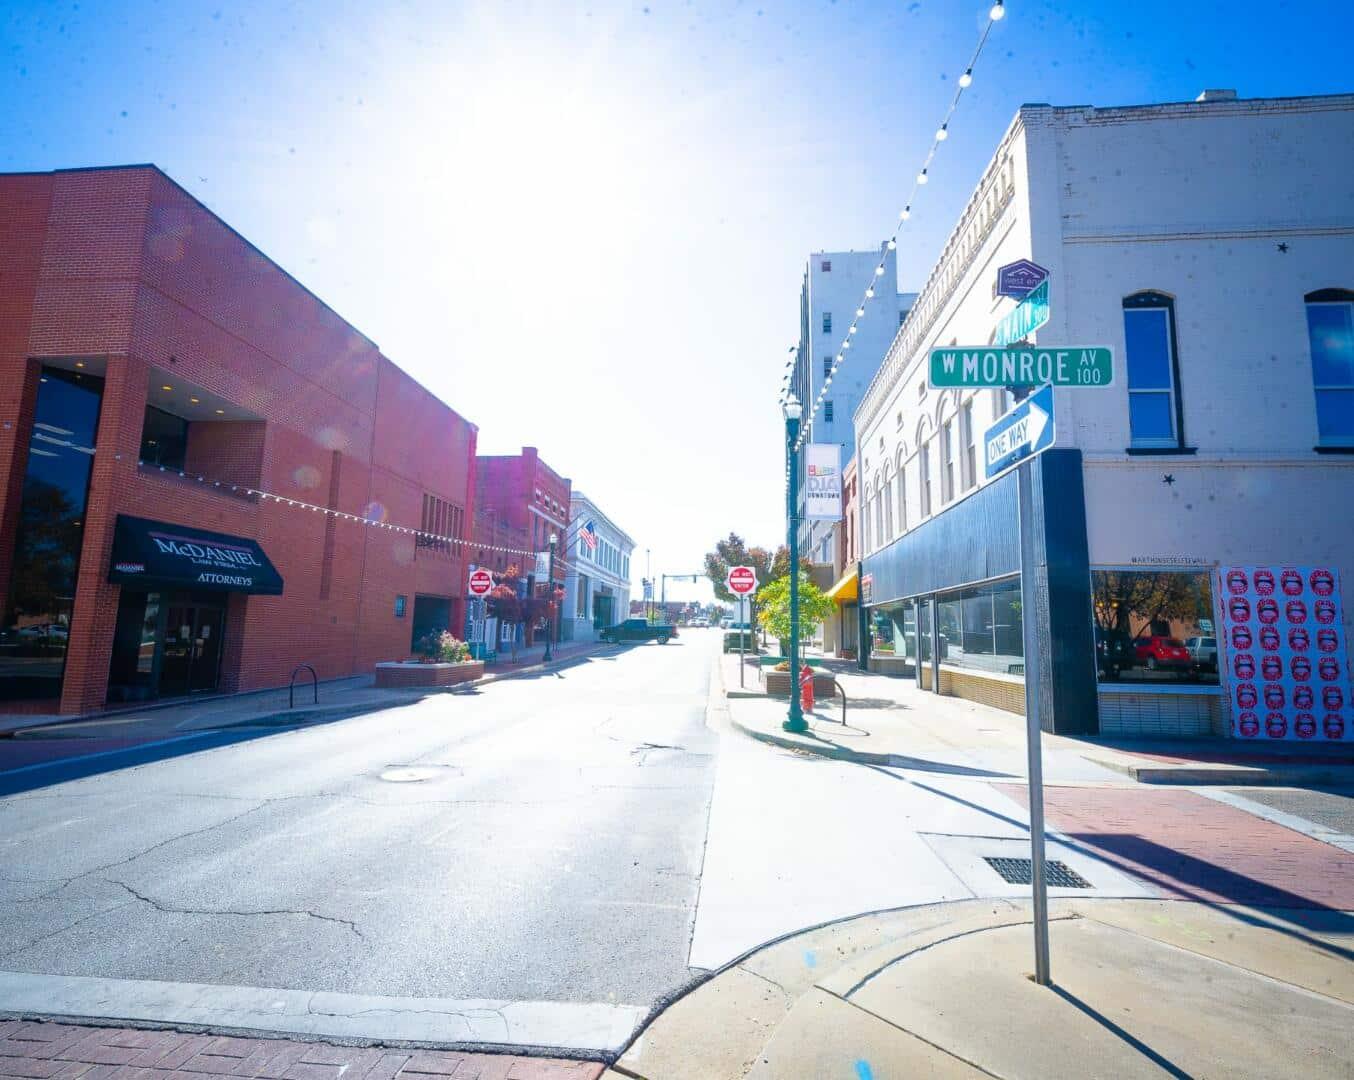 Jonesboro AR Gairhan Dental Care 2020 12 - We Love Jonesboro